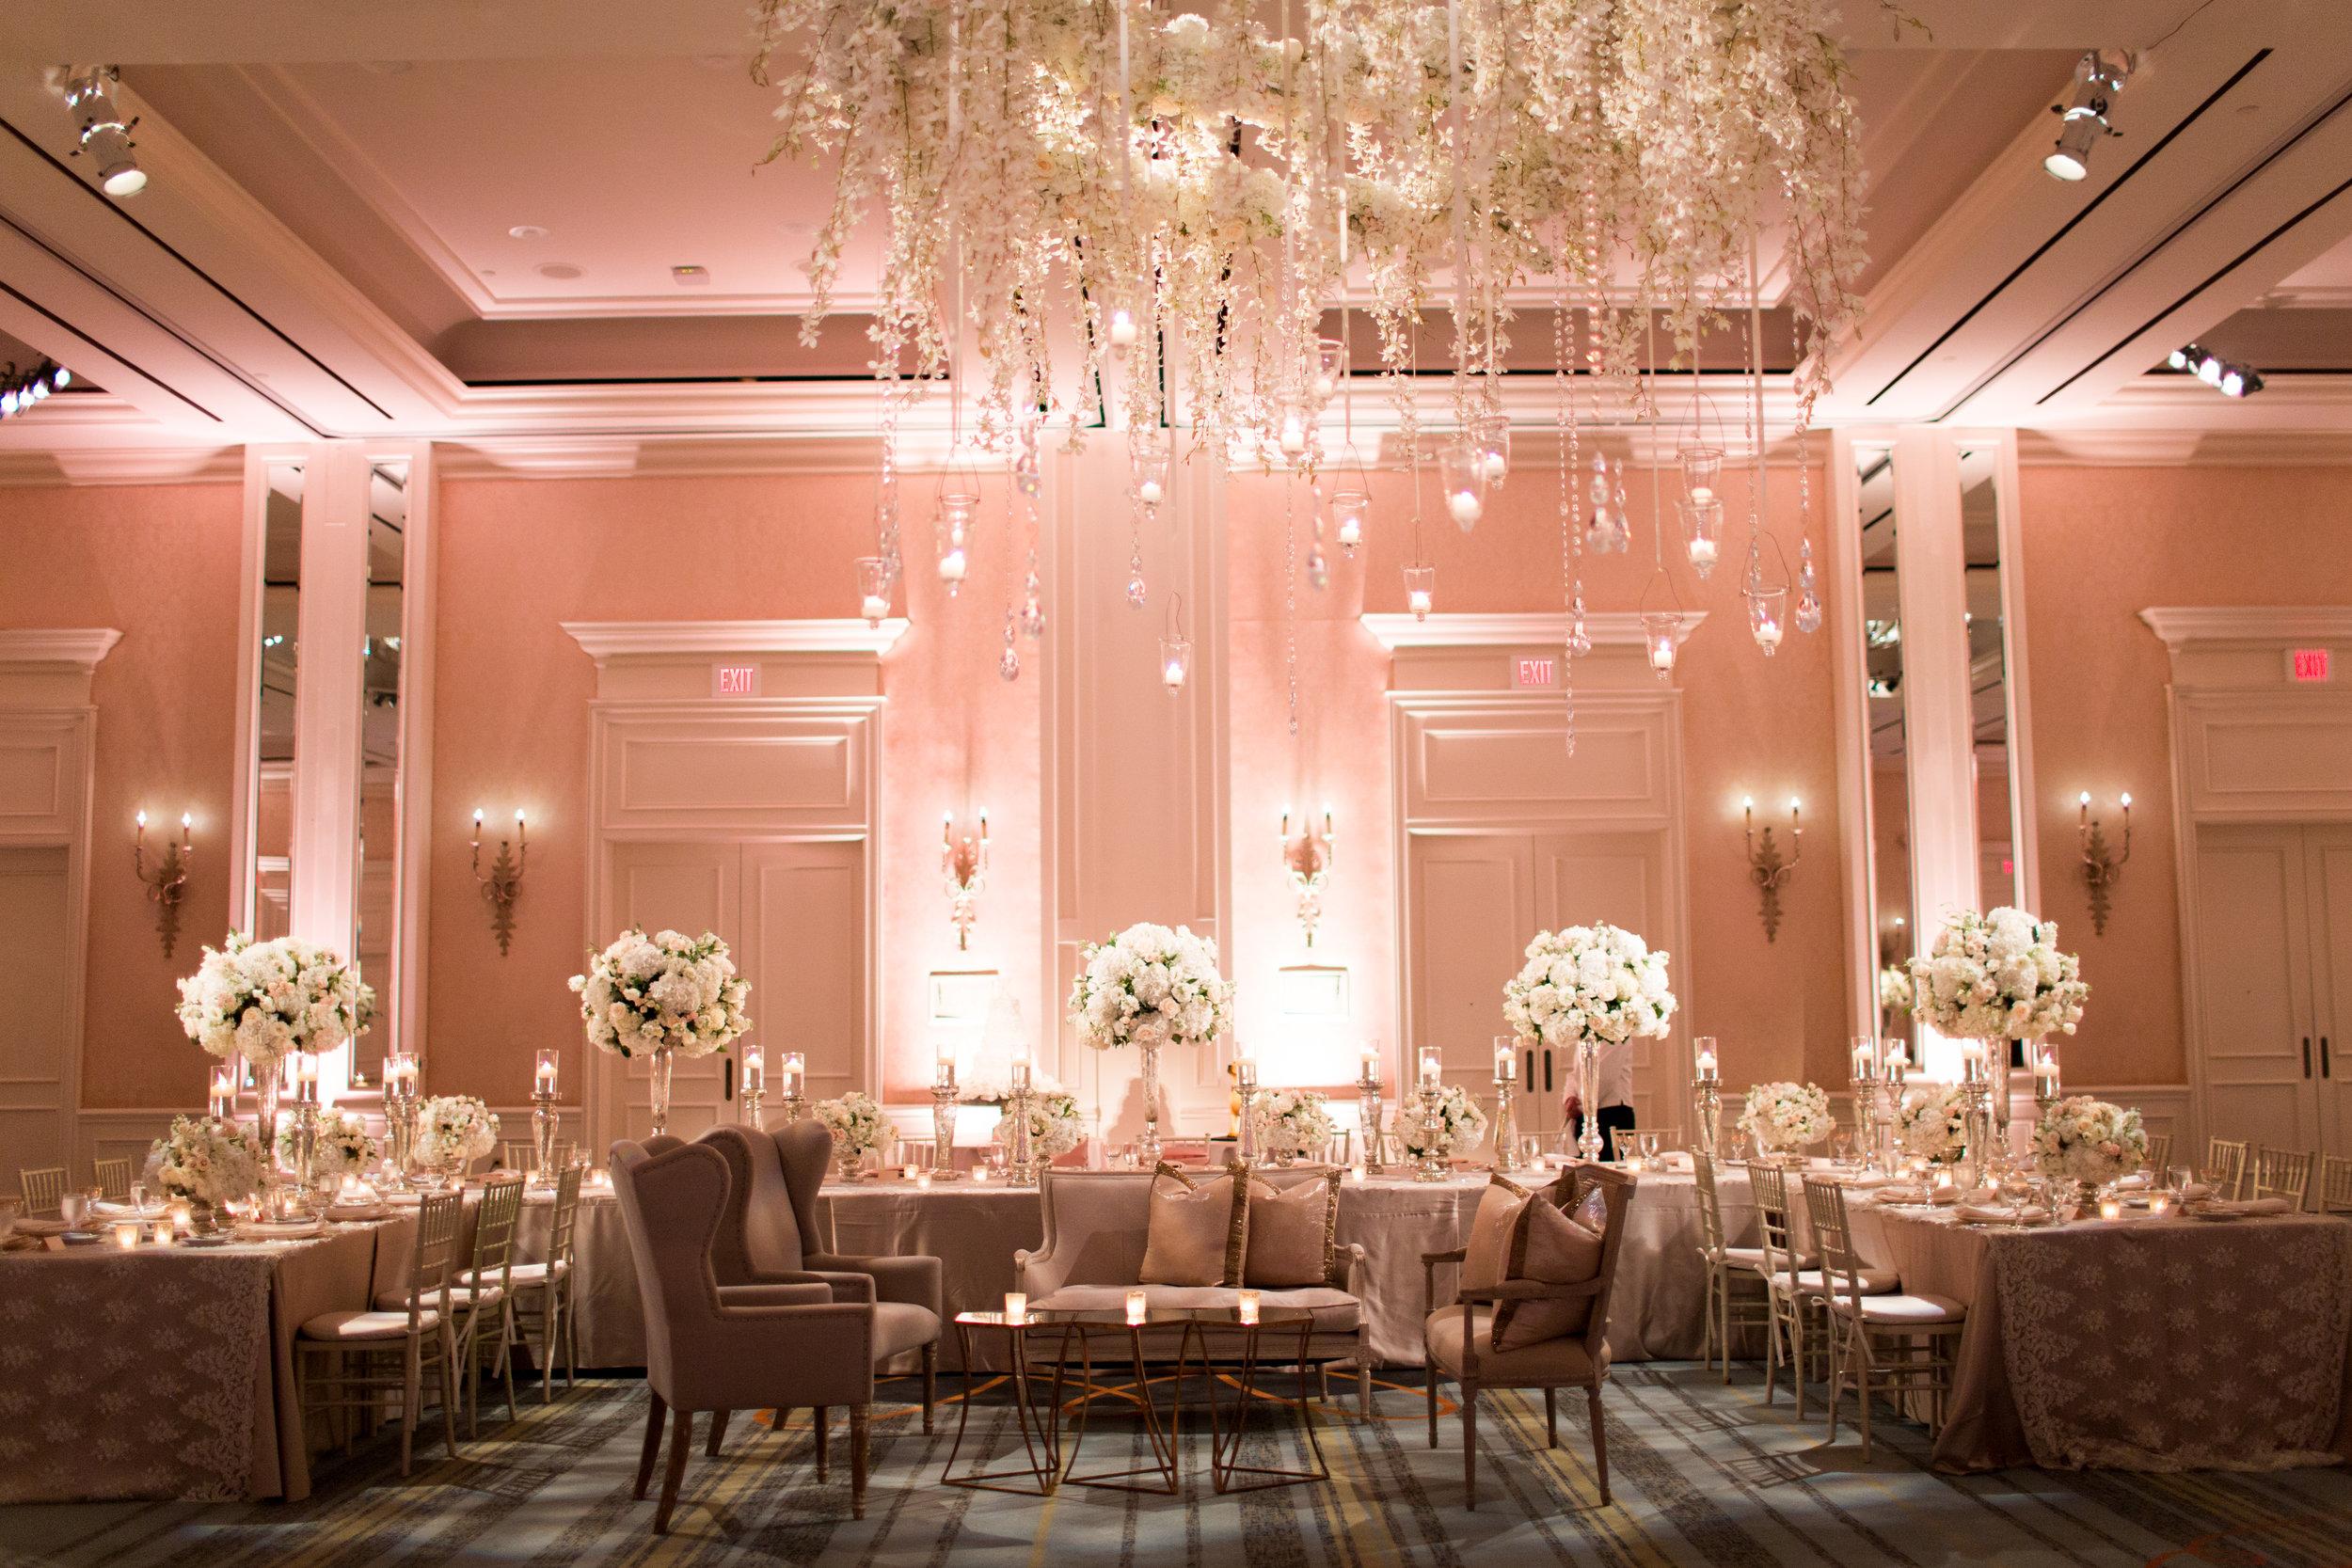 caroline_events_dallas_wedding_planner_four_seasons_resort_wedding